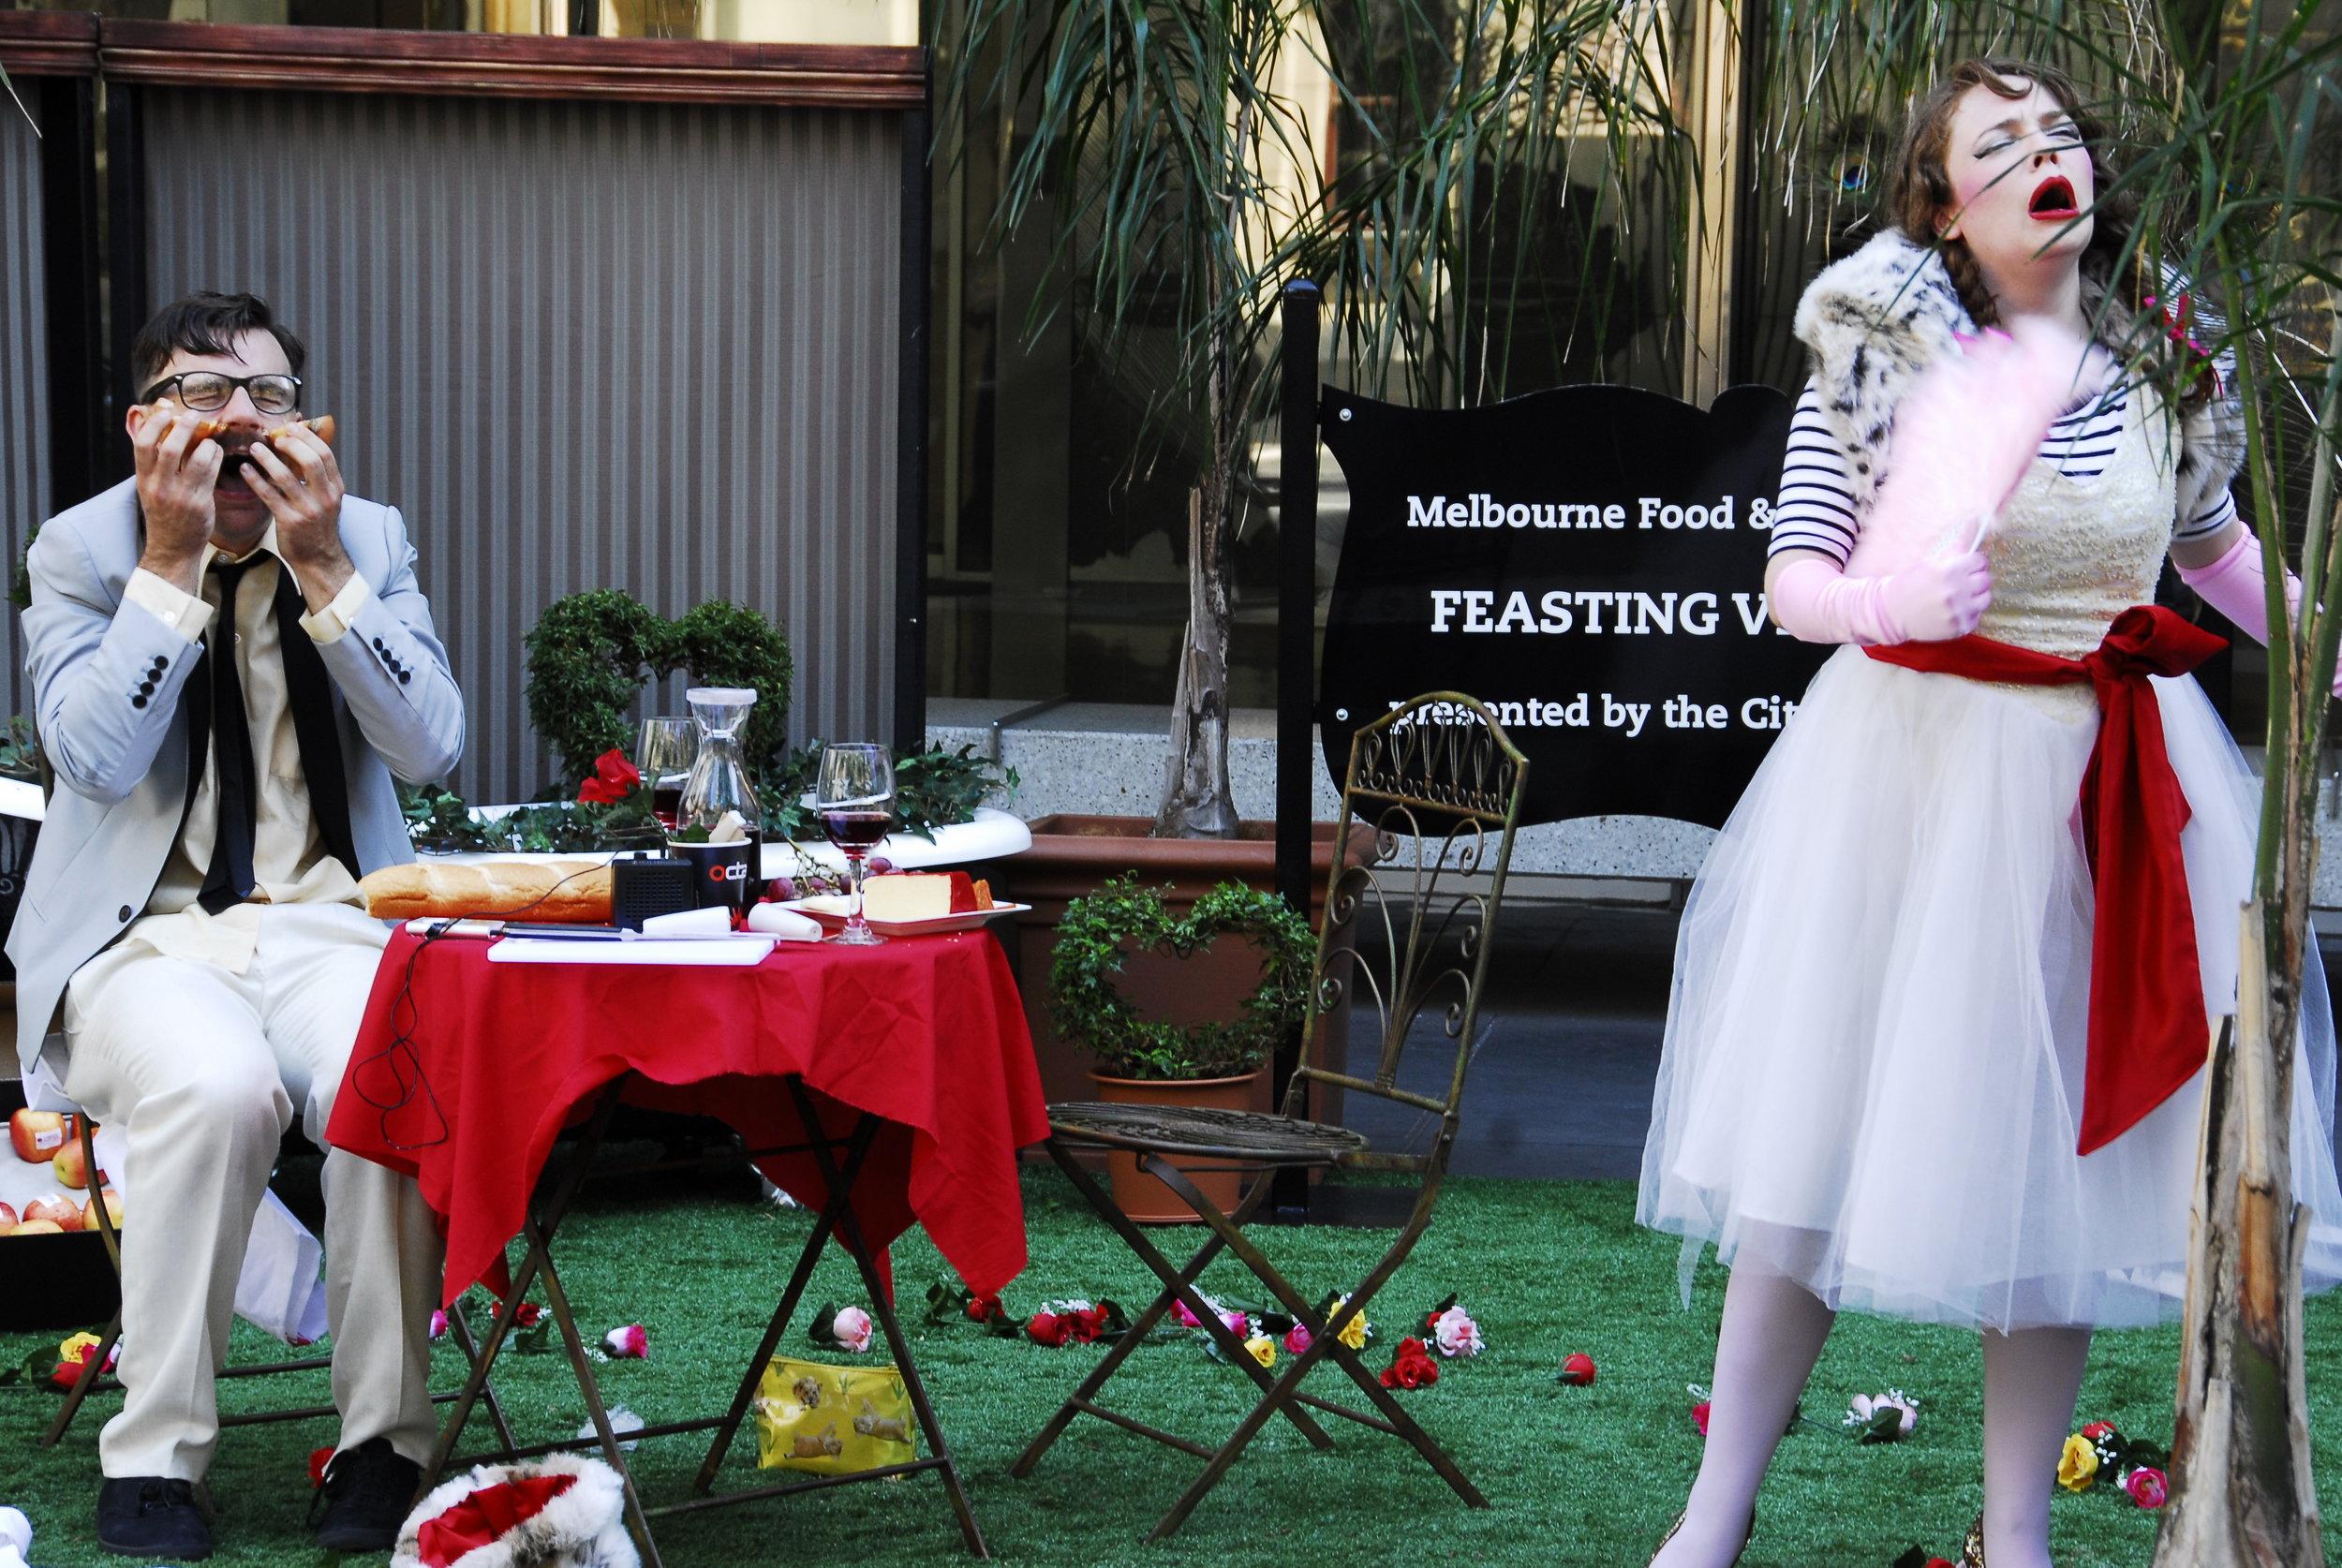 Feasting Vignettes  - pop-up event activations in Melbourne CBD